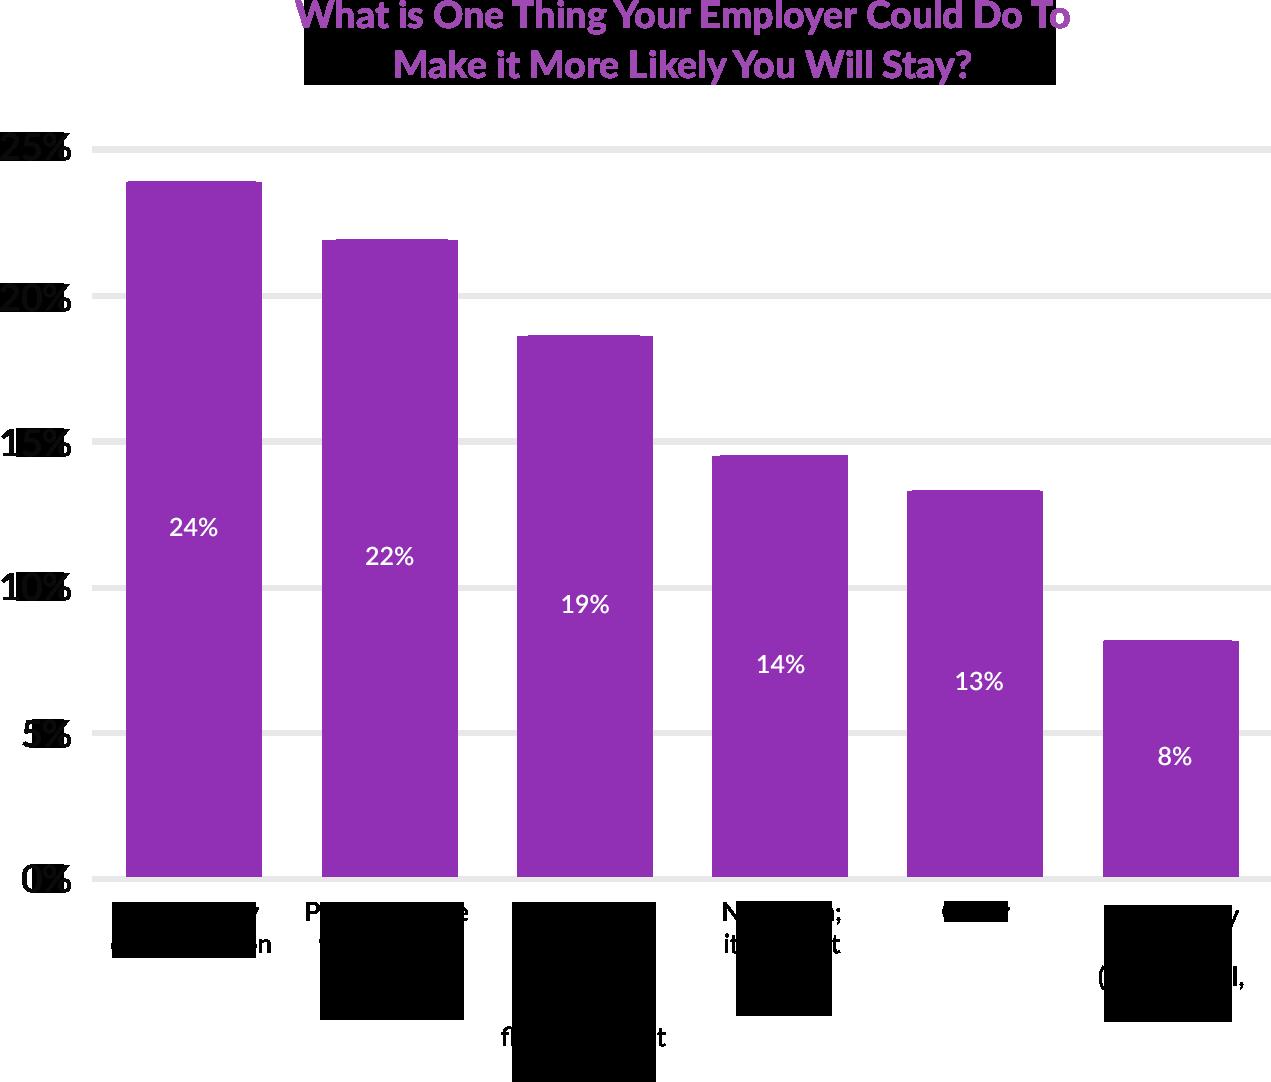 Fairygodboss survey of retention factors